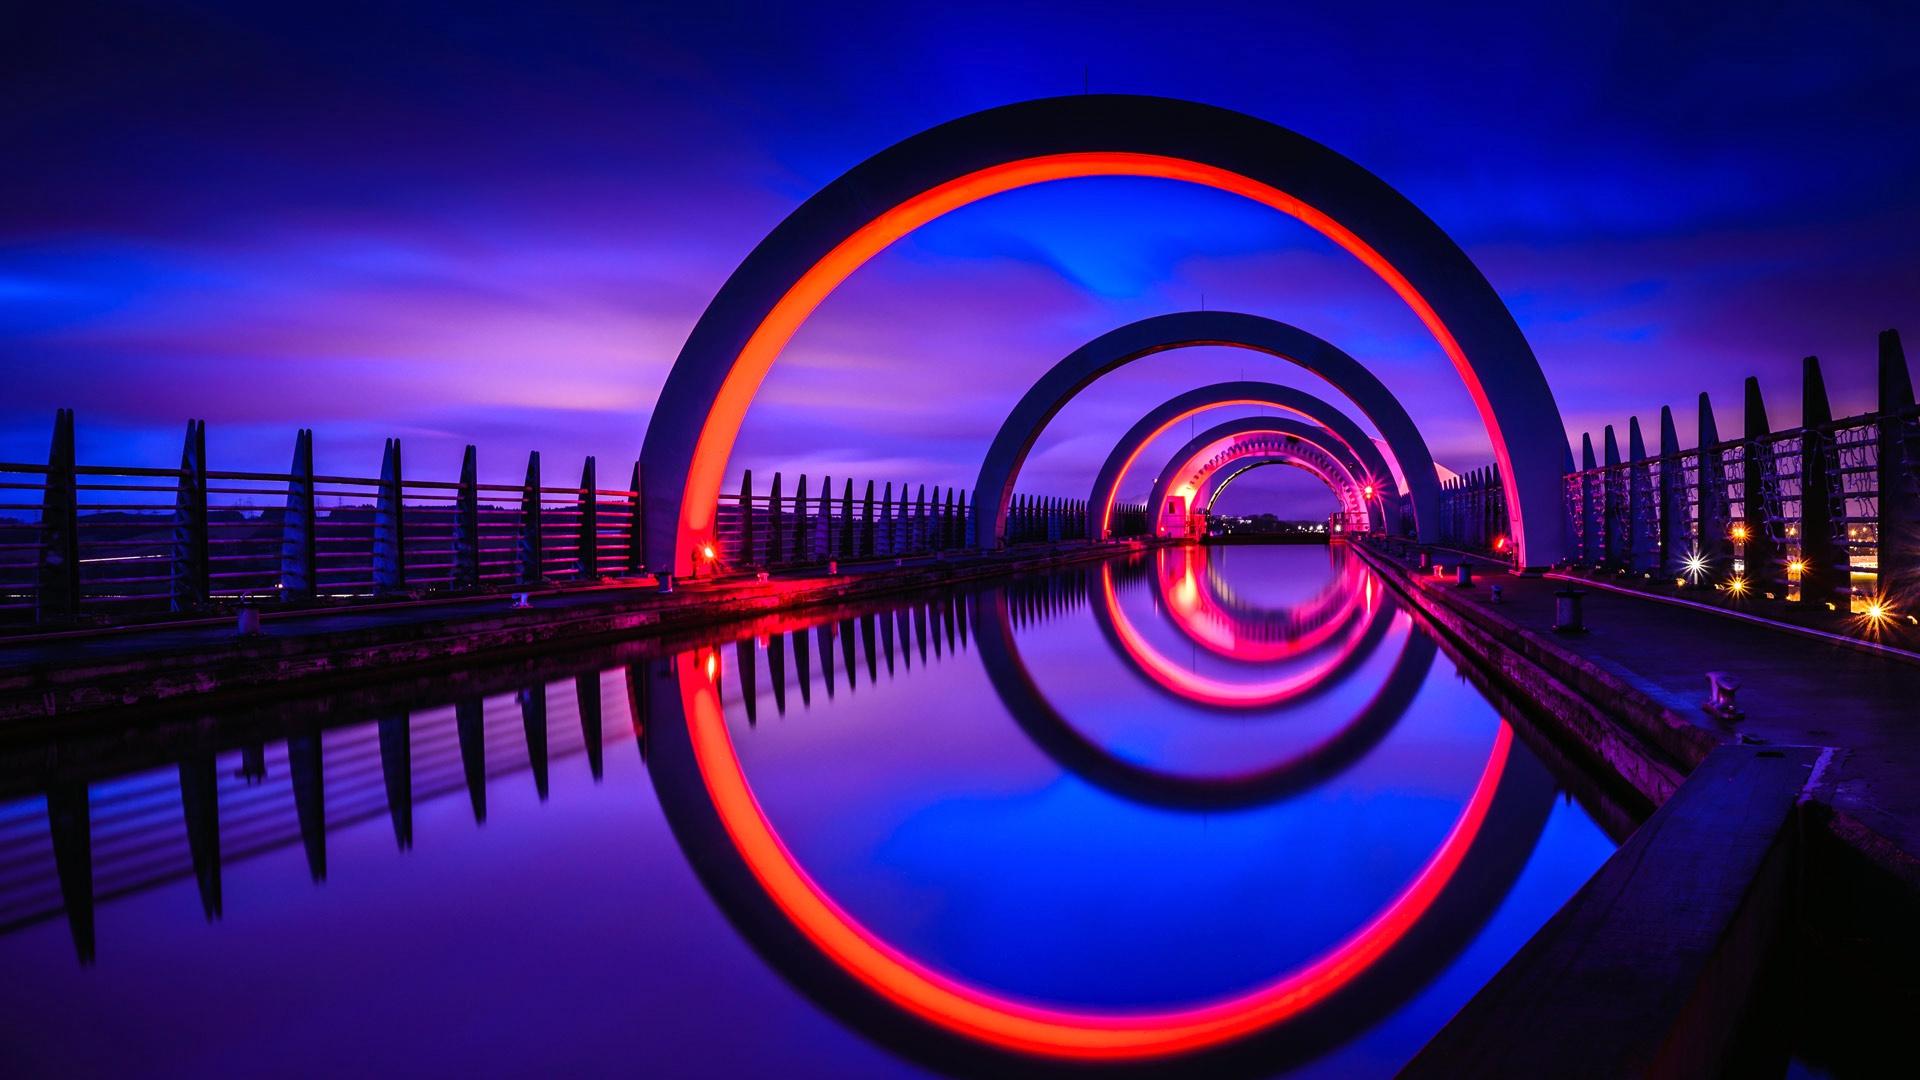 Falkirk Wheel Light Night Reflection Scotland 1920x1080